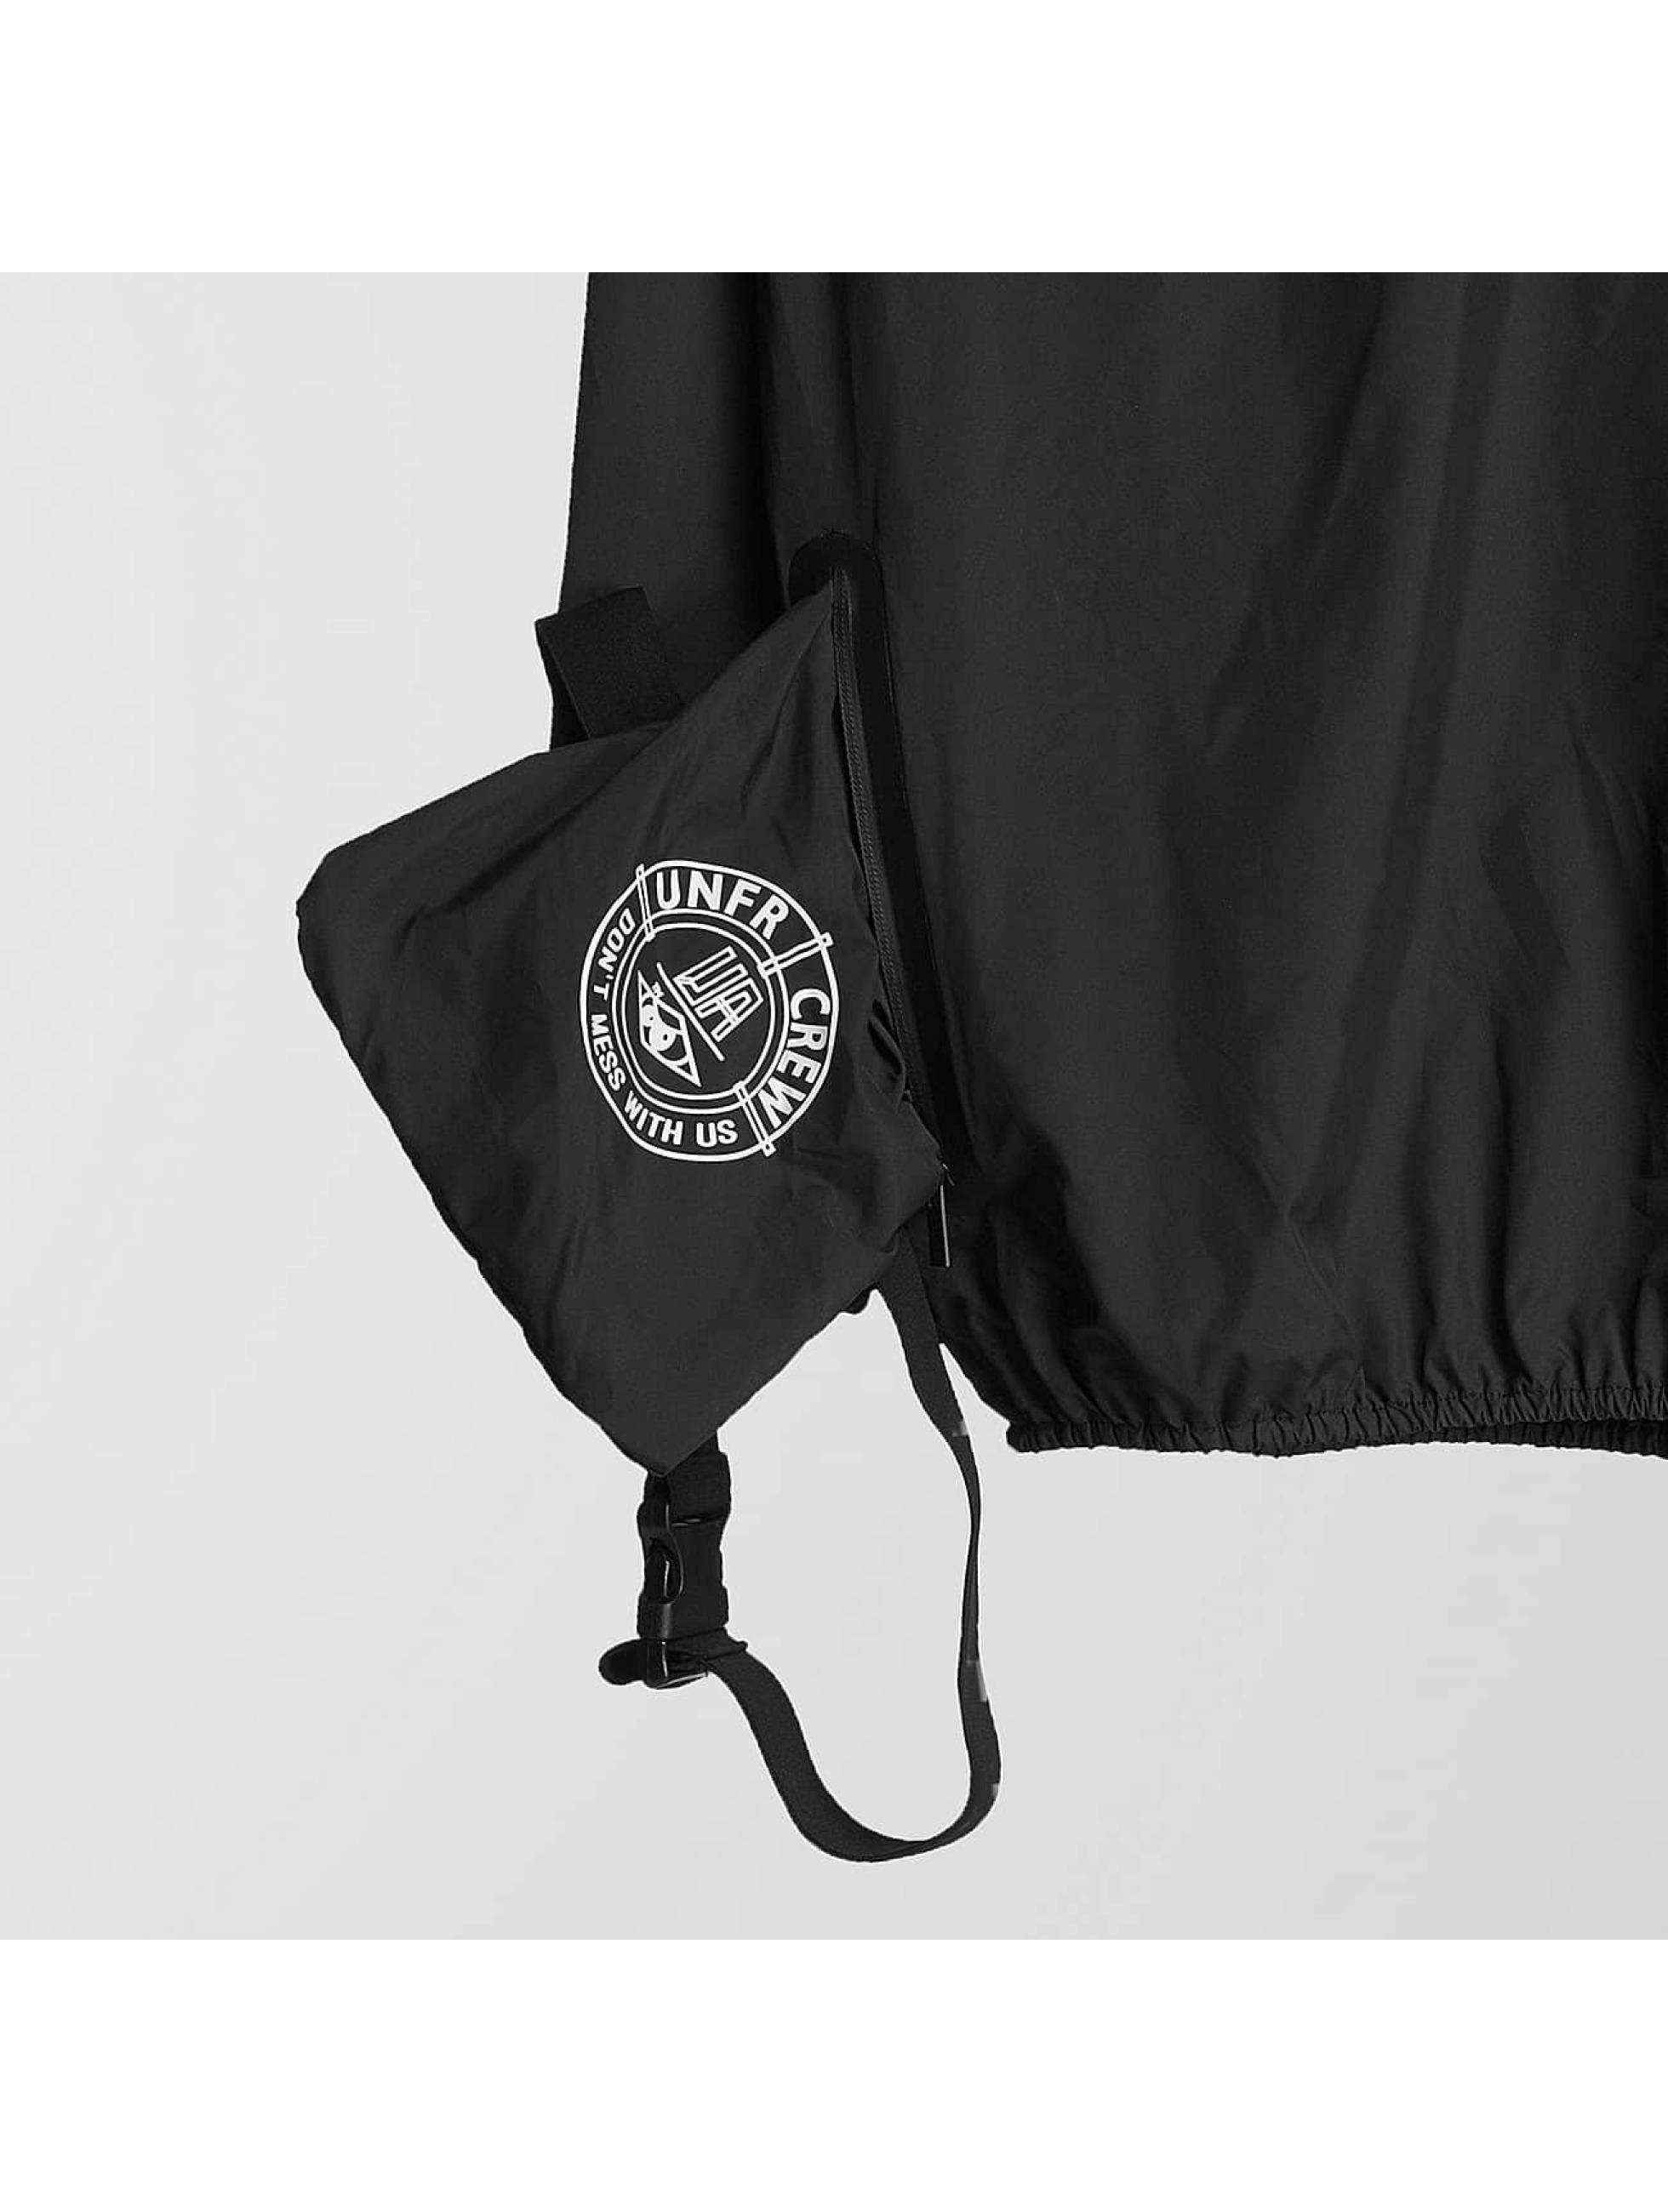 UNFAIR ATHLETICS Transitional Jackets DMWU svart